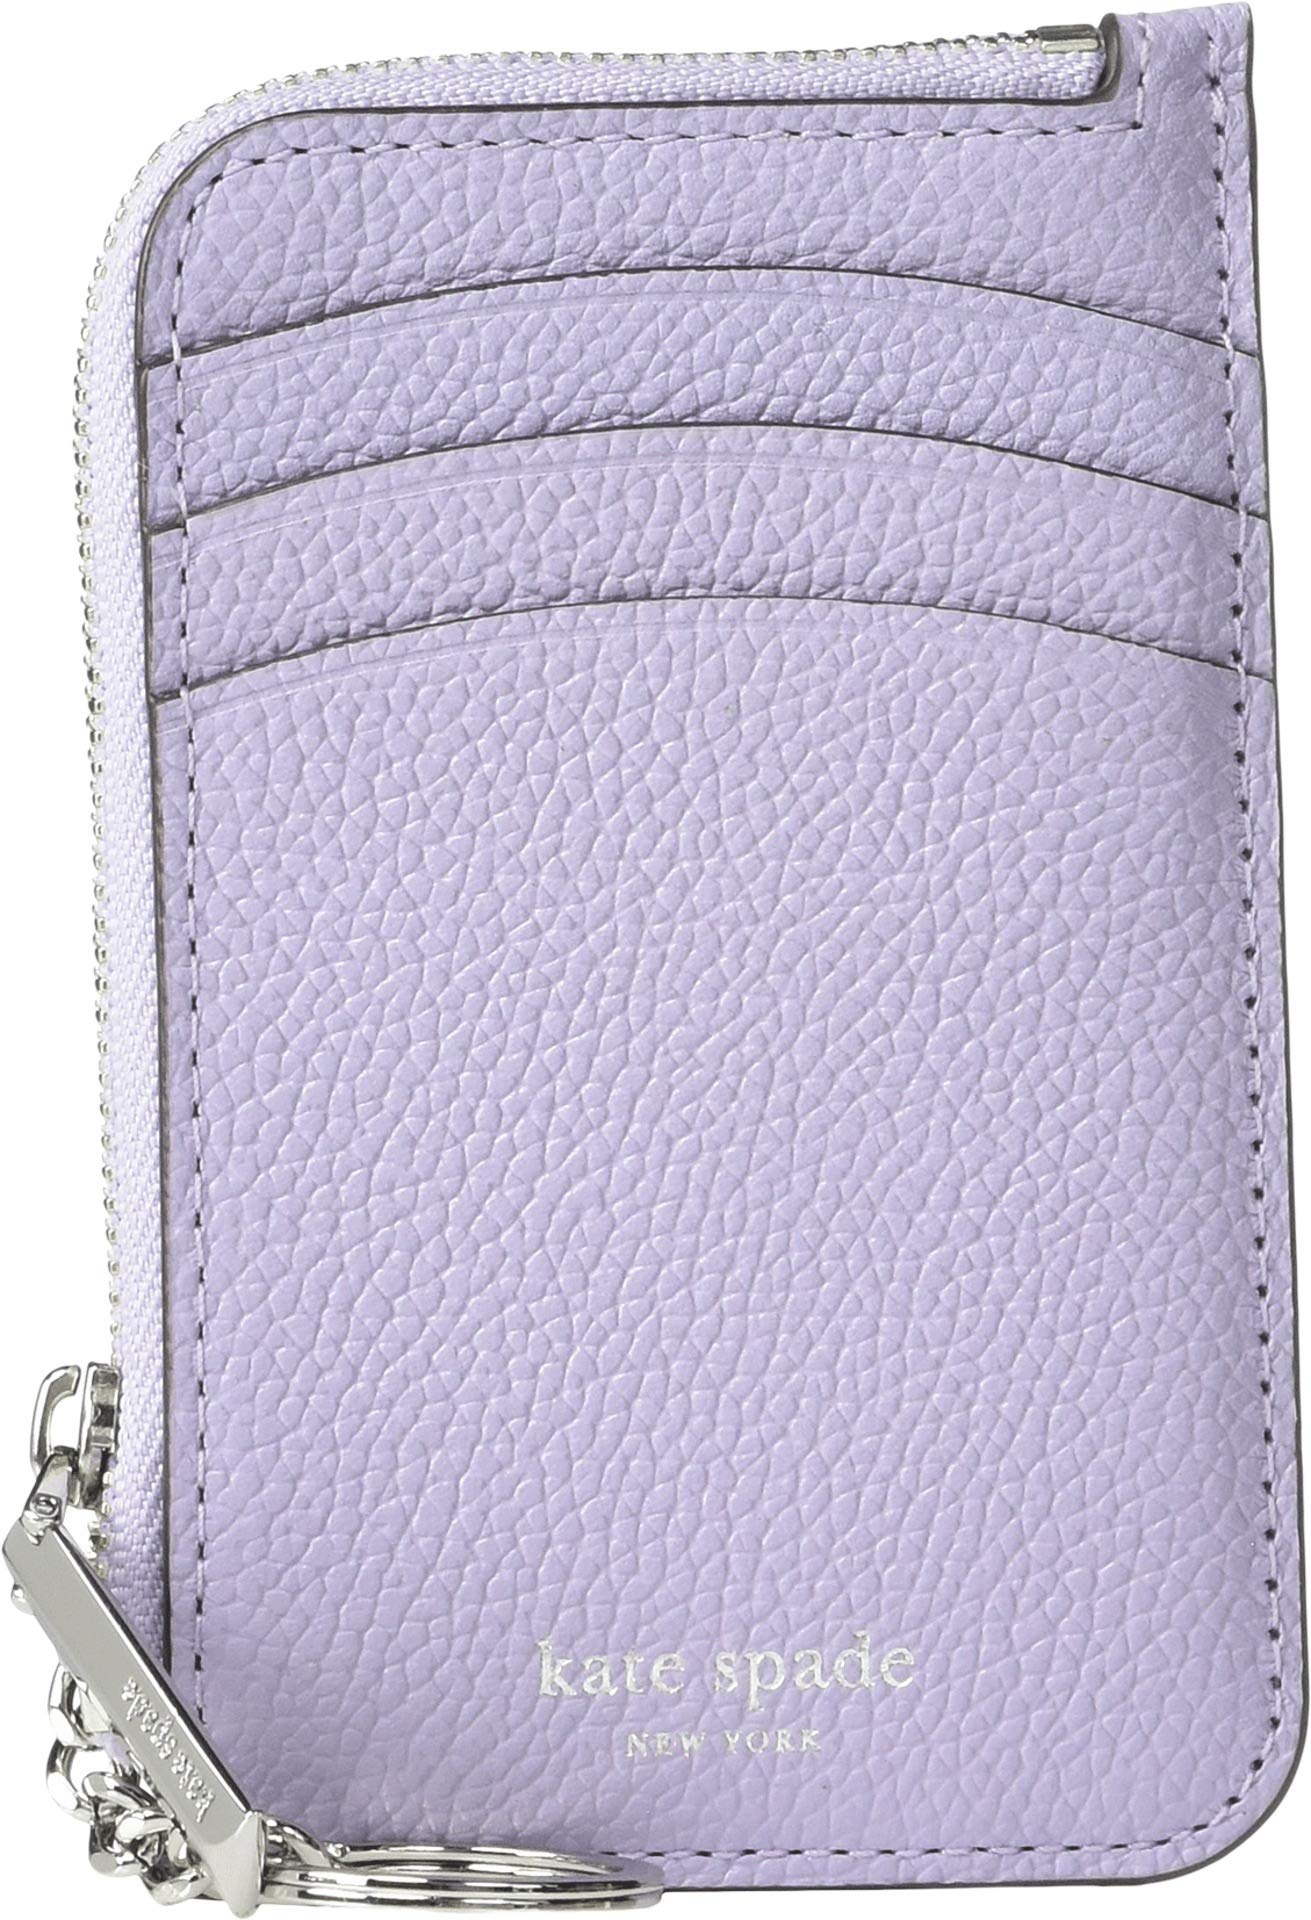 Kate Spade New York Women's Margaux Zip Card Holder, Frozen Lilac, Purple, One Size